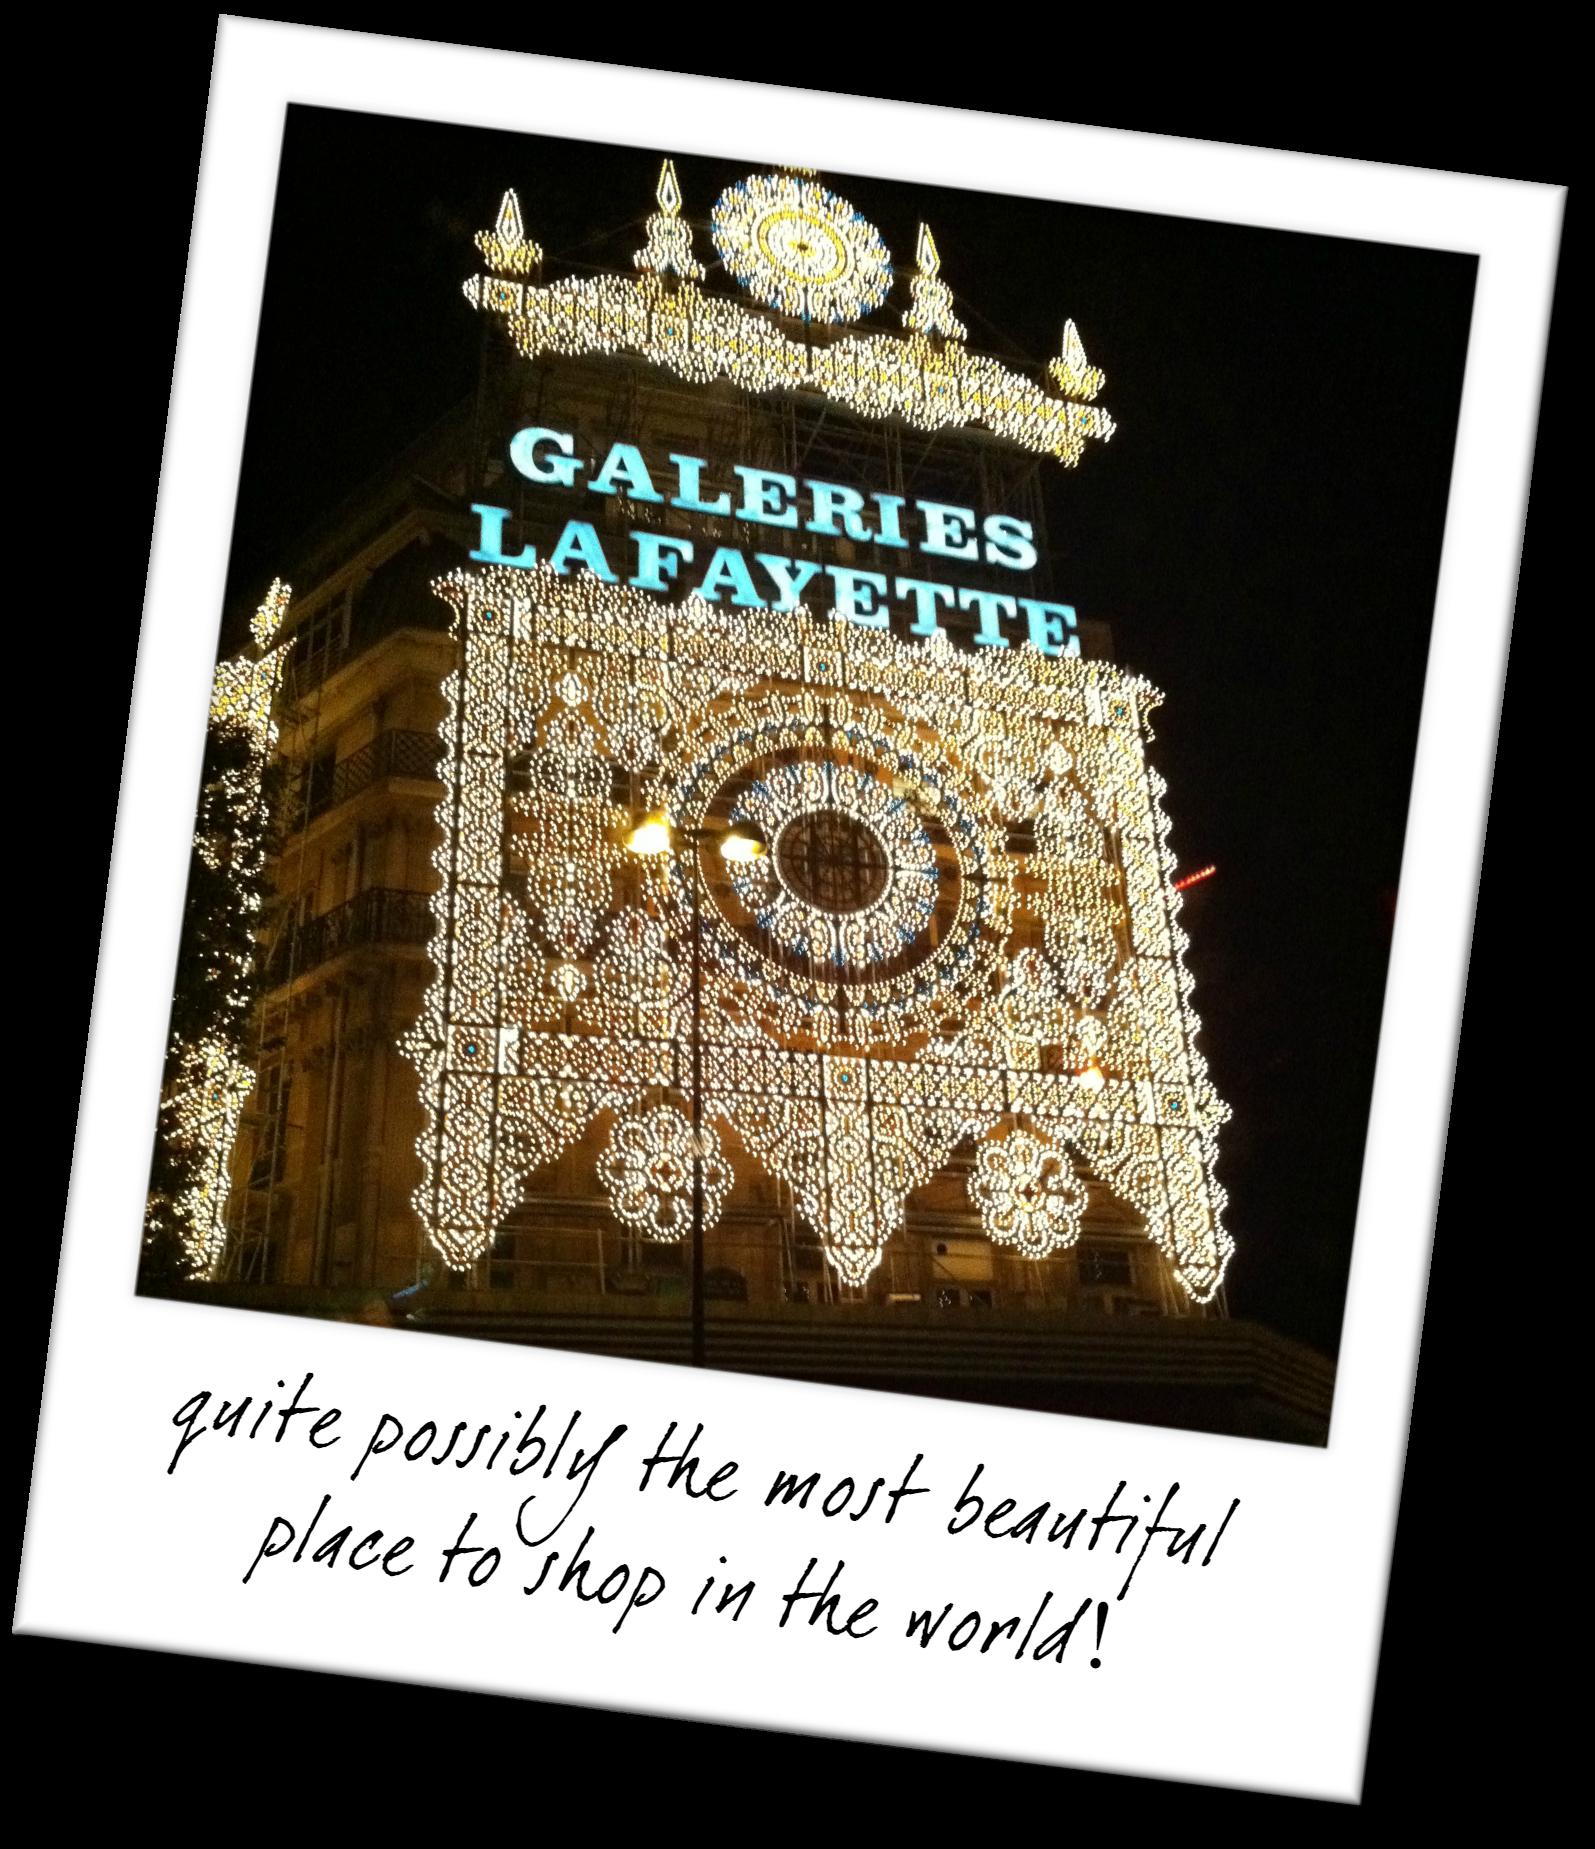 The Best Places to Shop in Paris - Galeries Lafayette